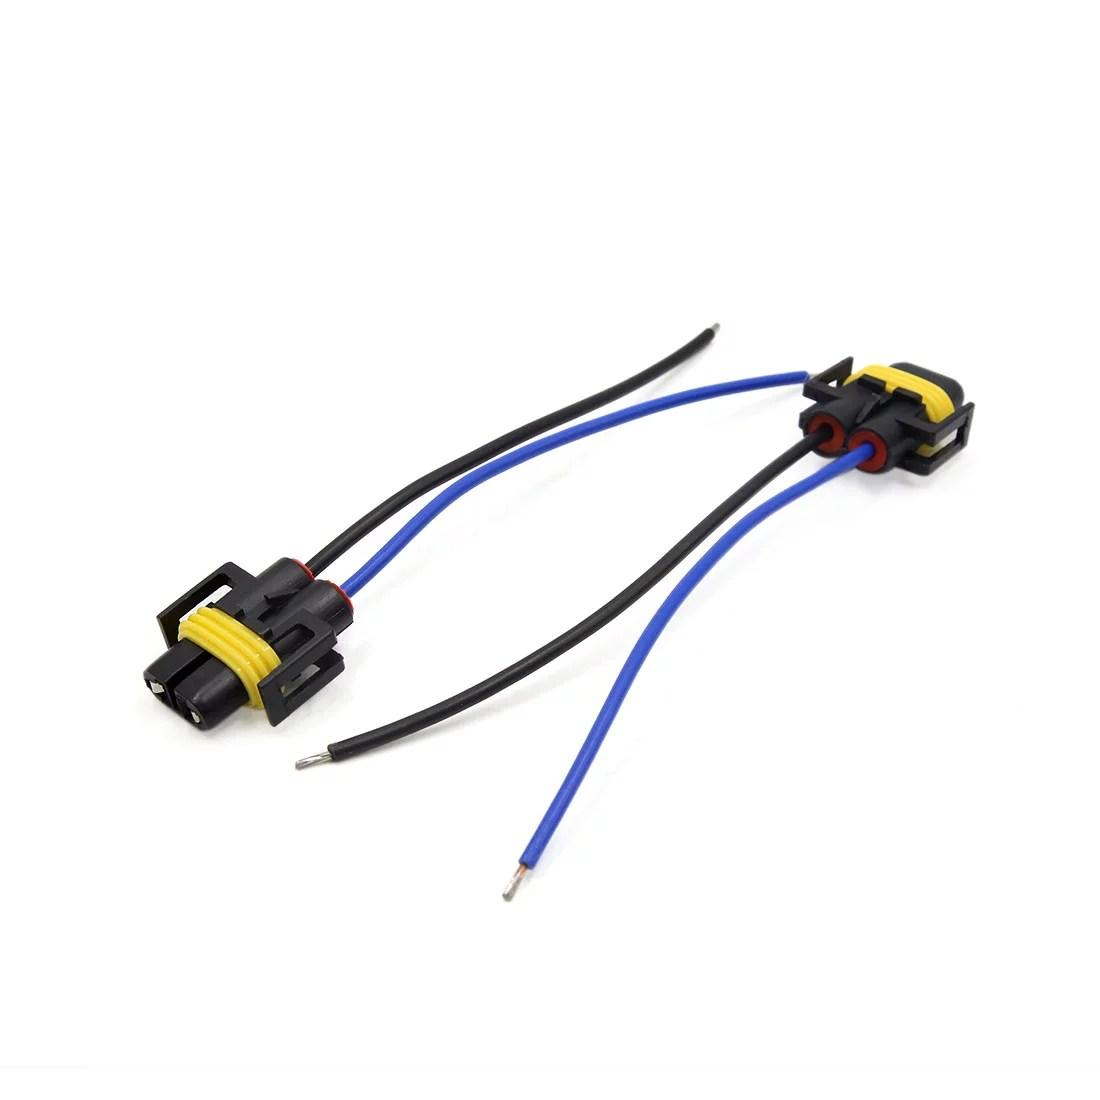 h11 headlight wiring harness